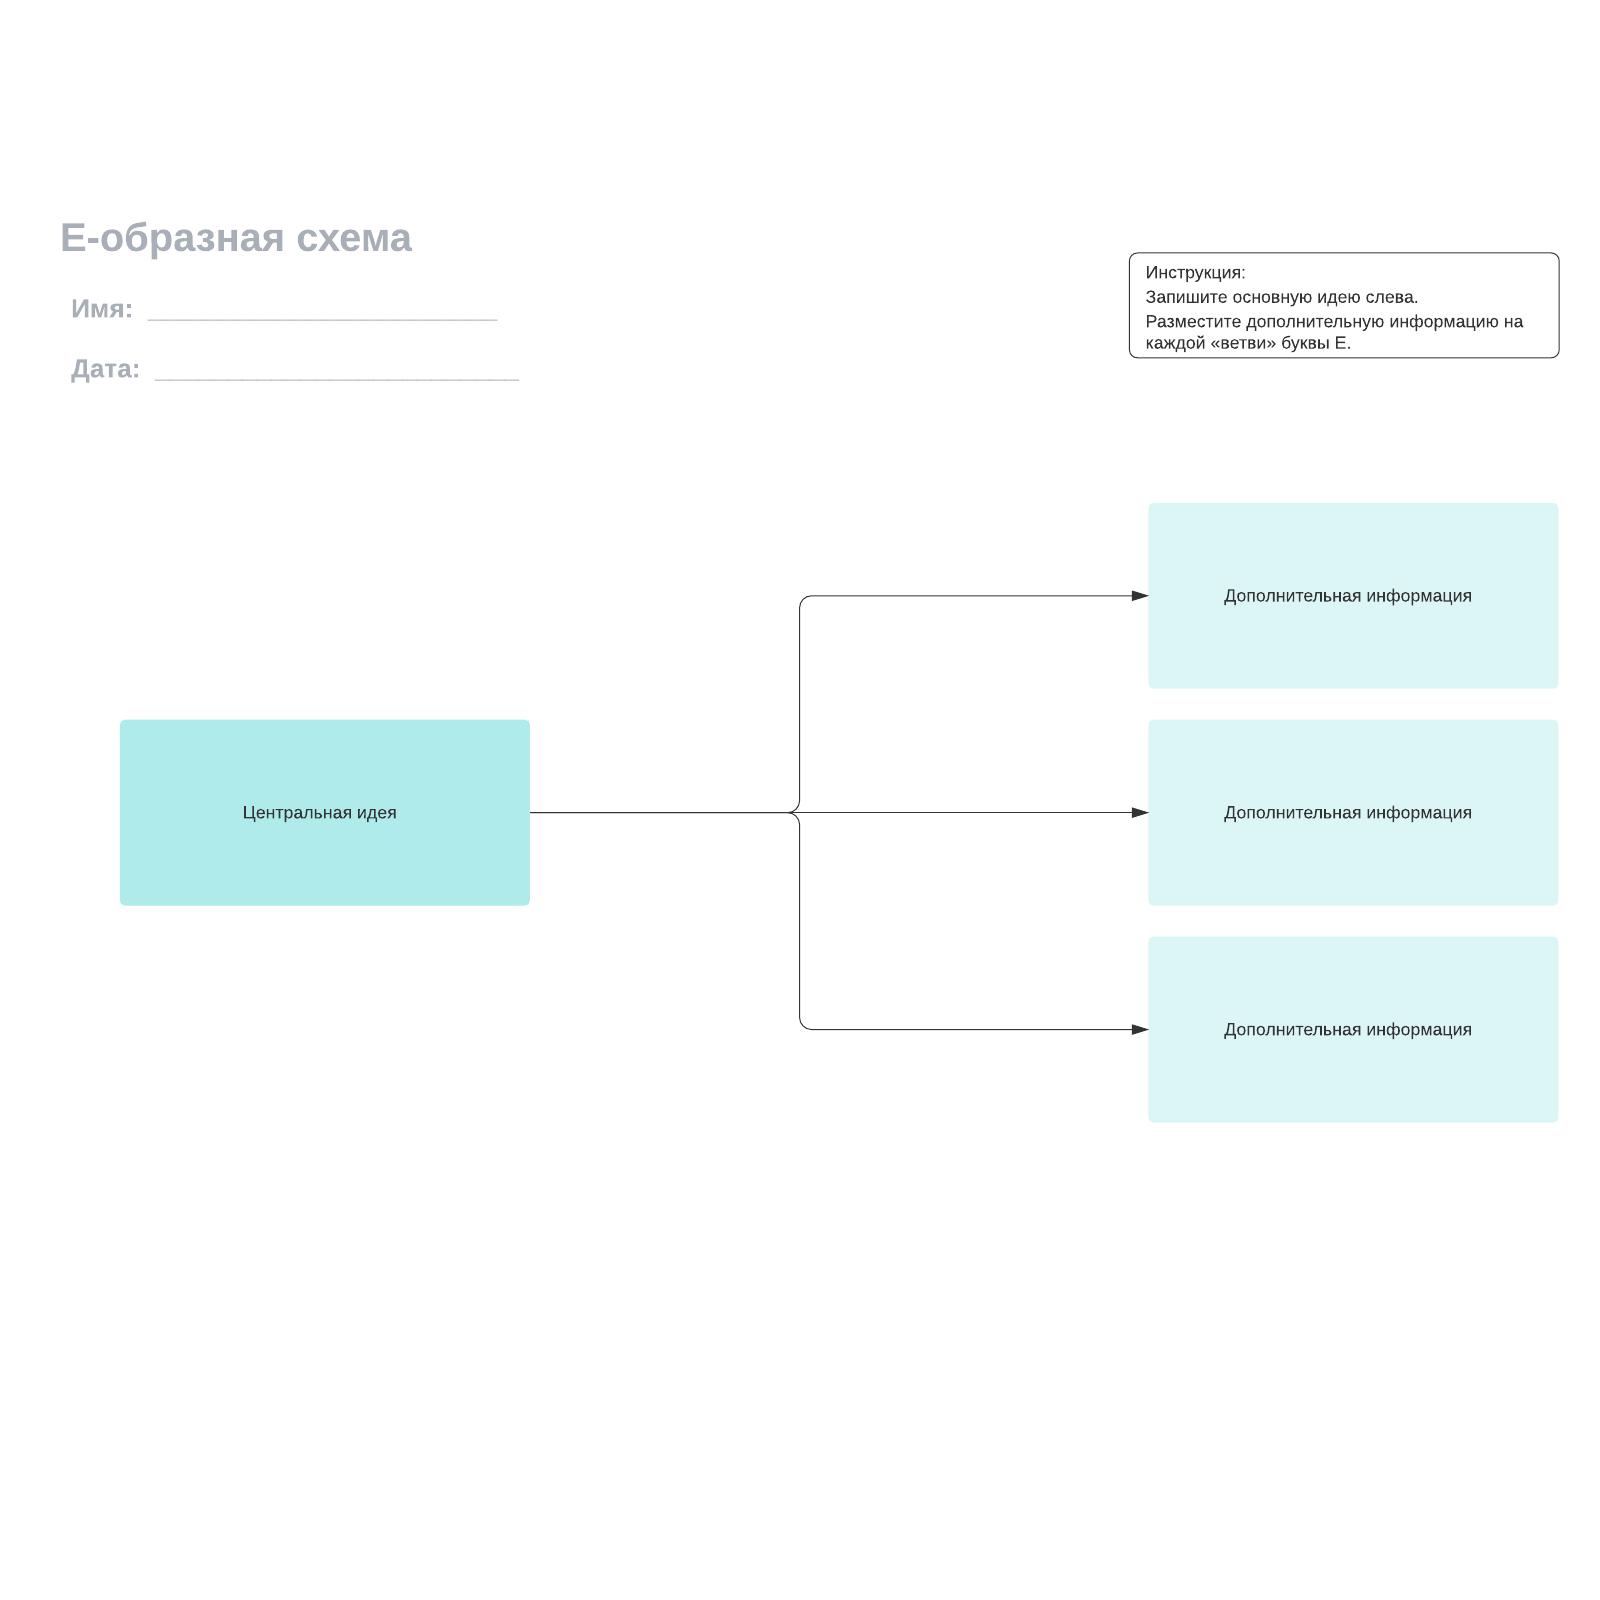 E-образная схема